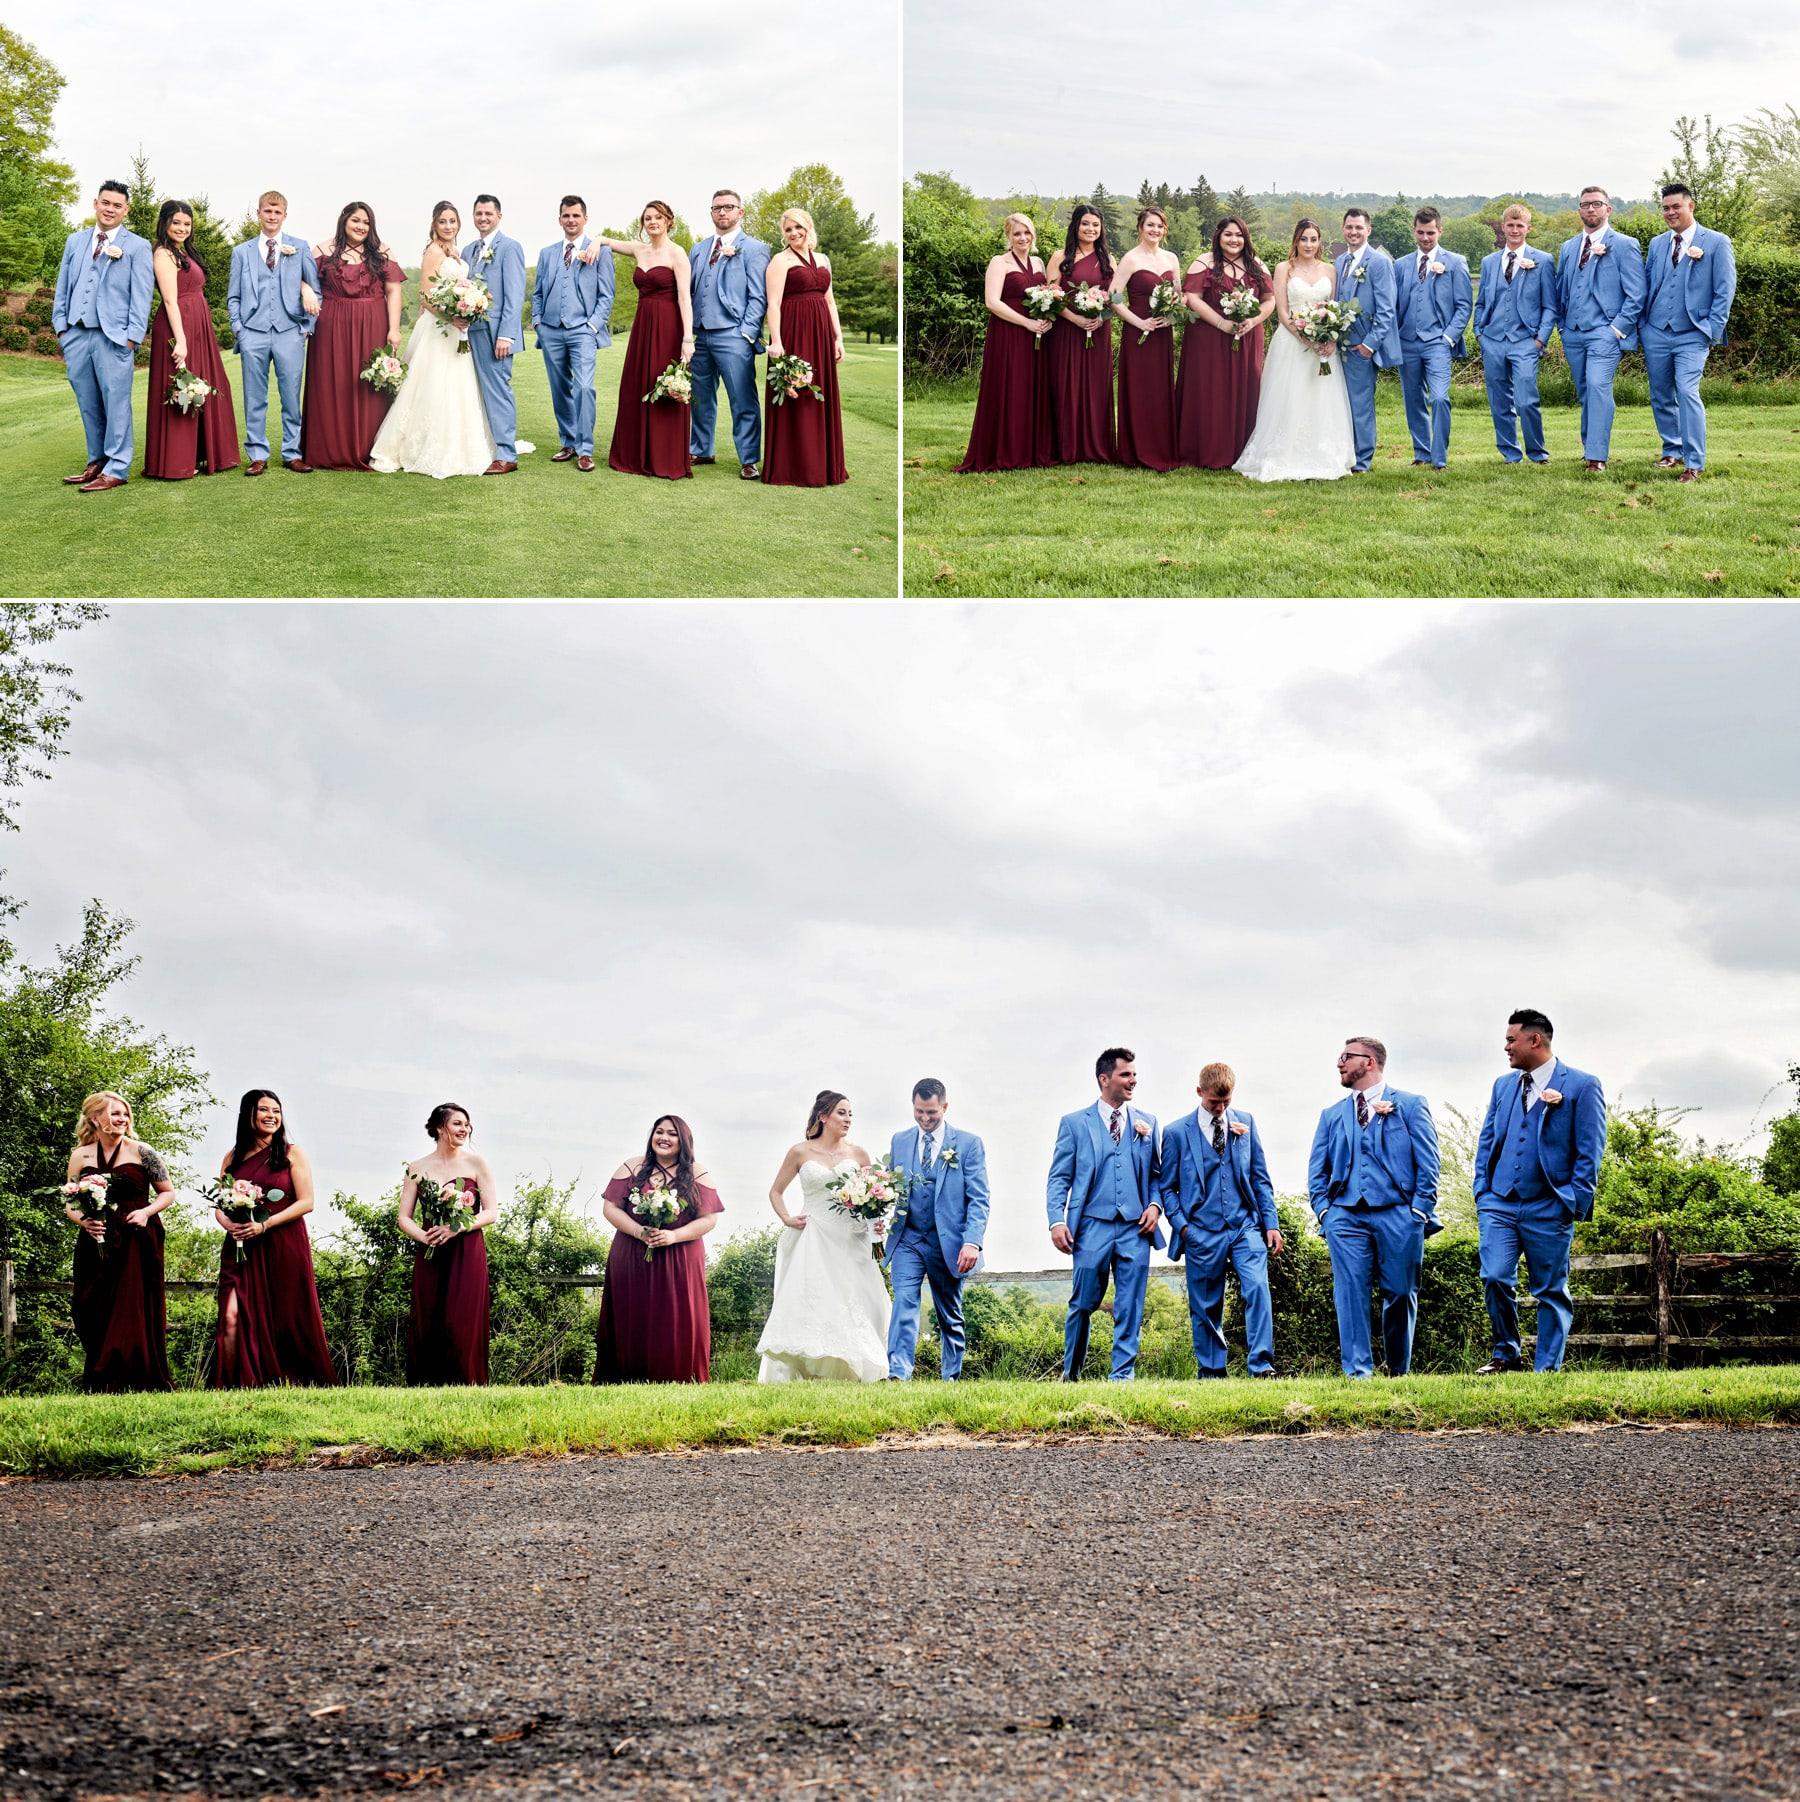 bridal party photos at basking ridge country club